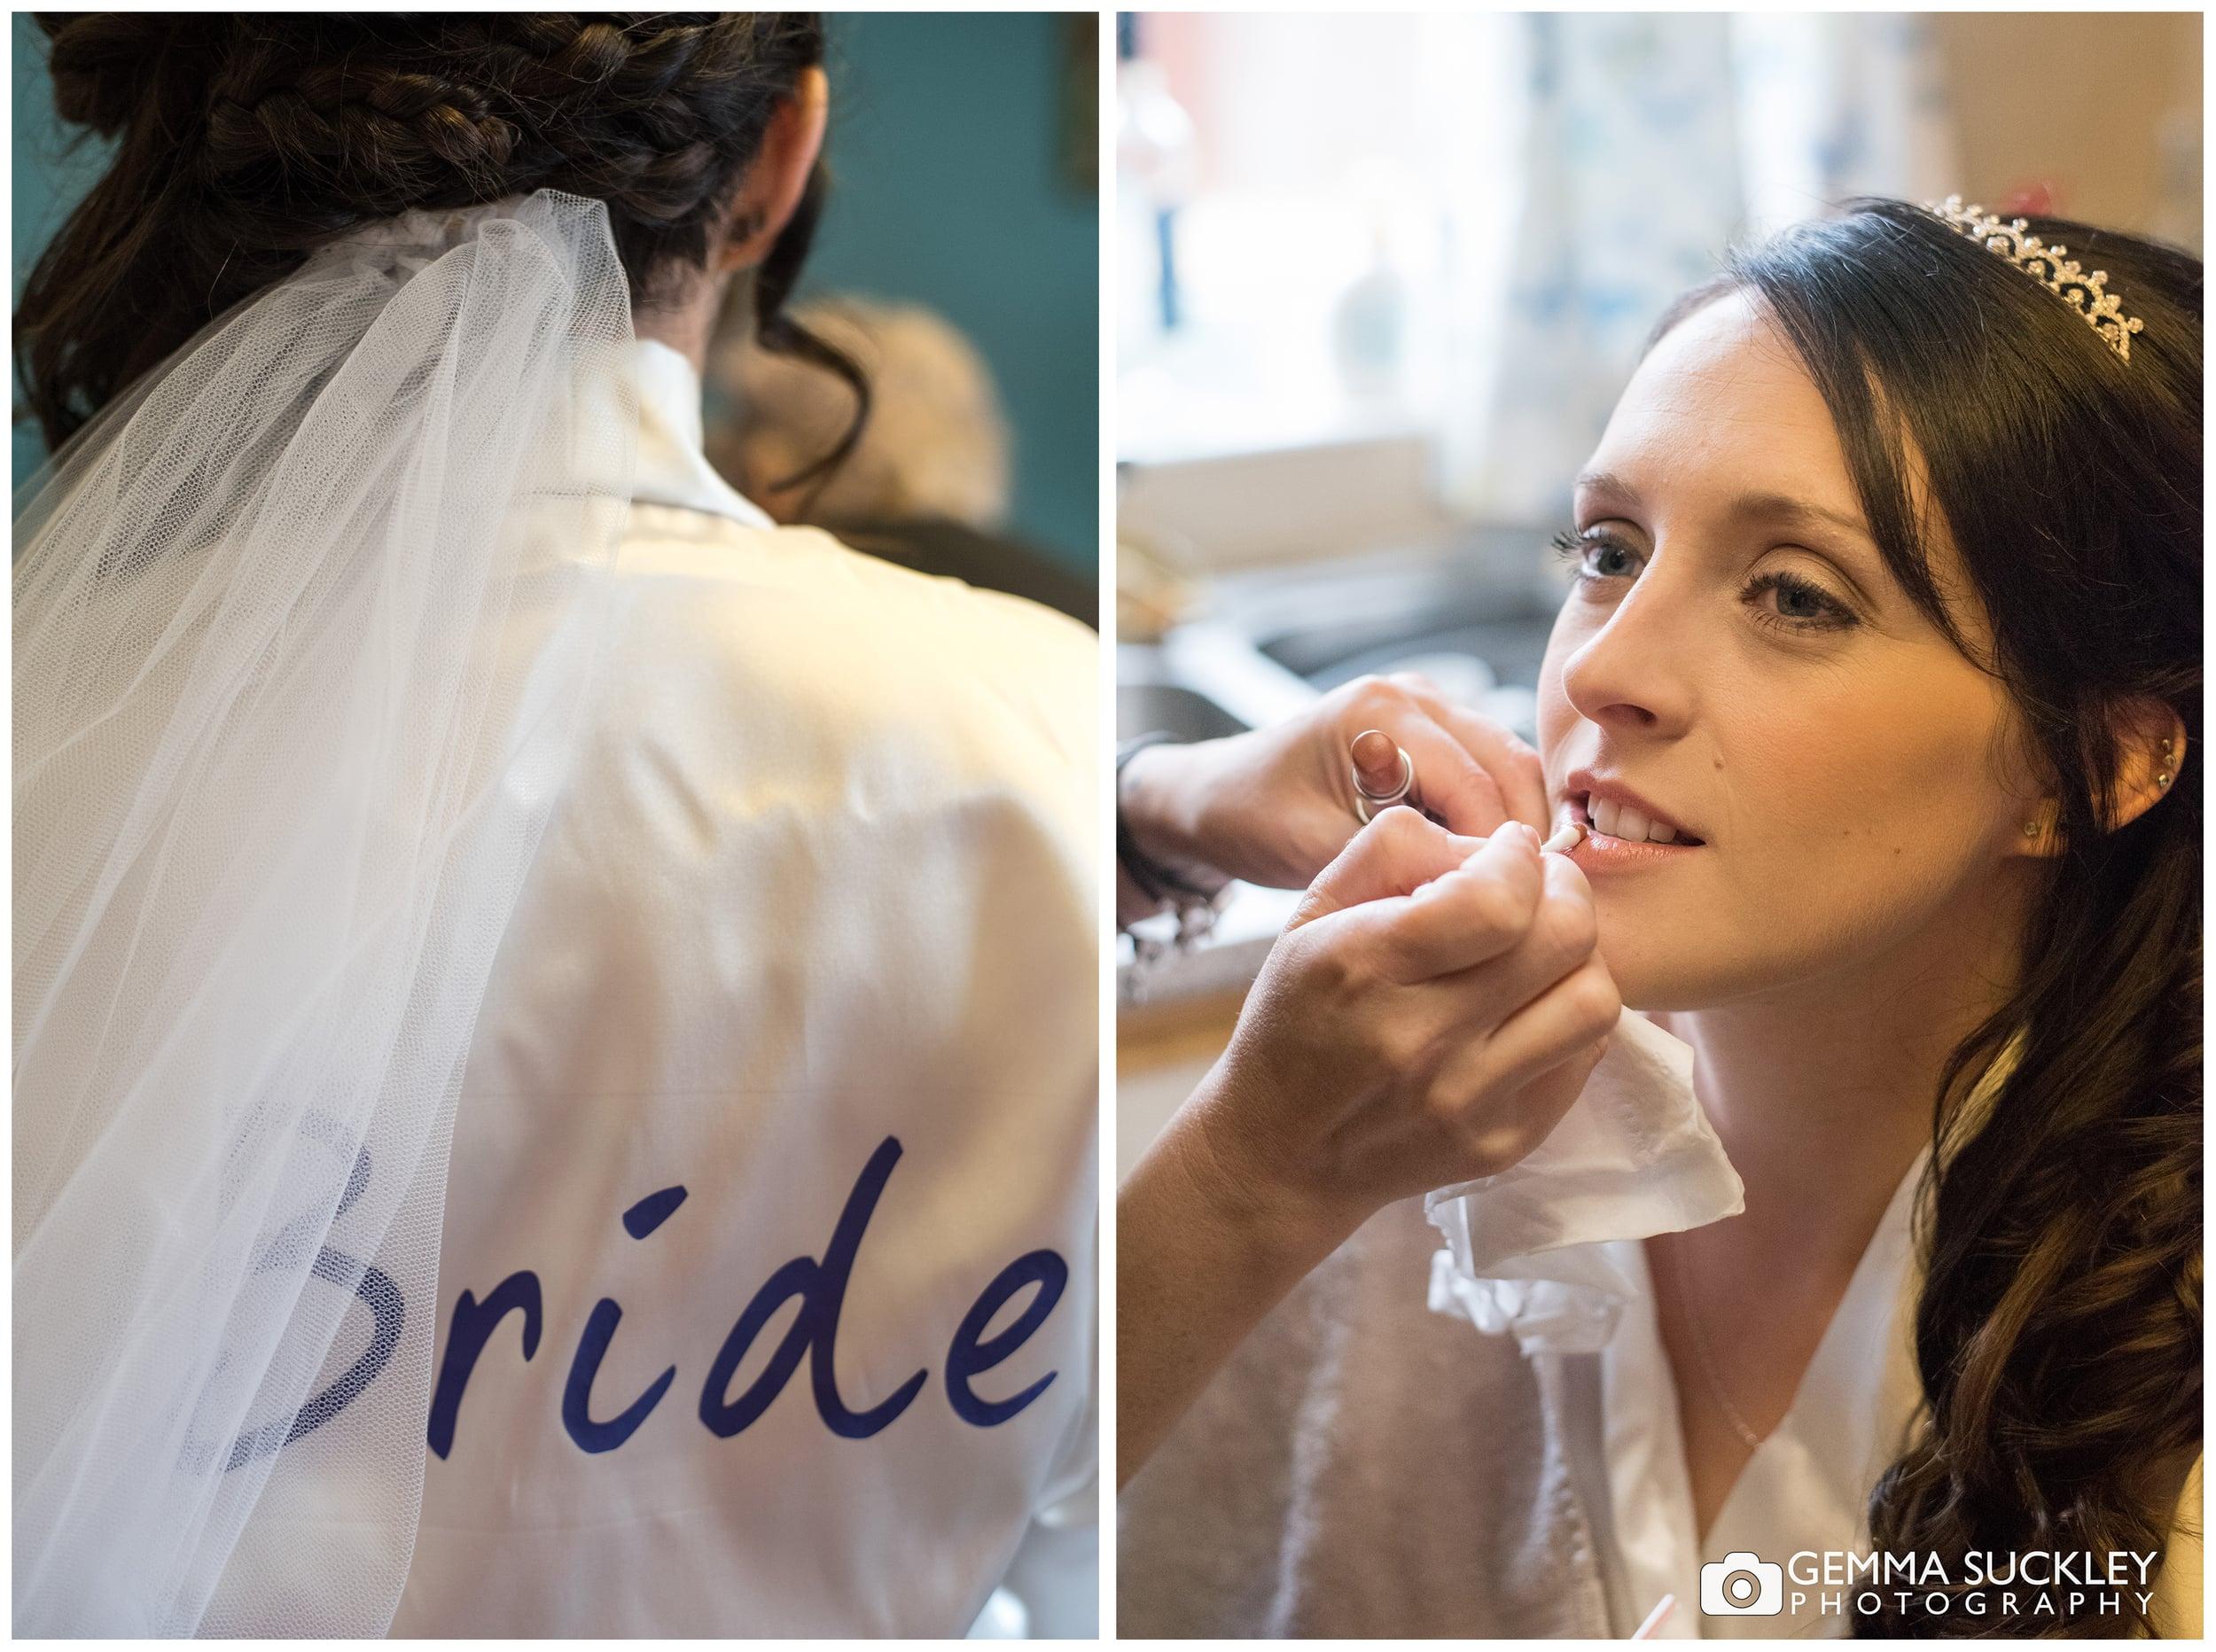 Bridal-preparation-skipton-weddings.jpg